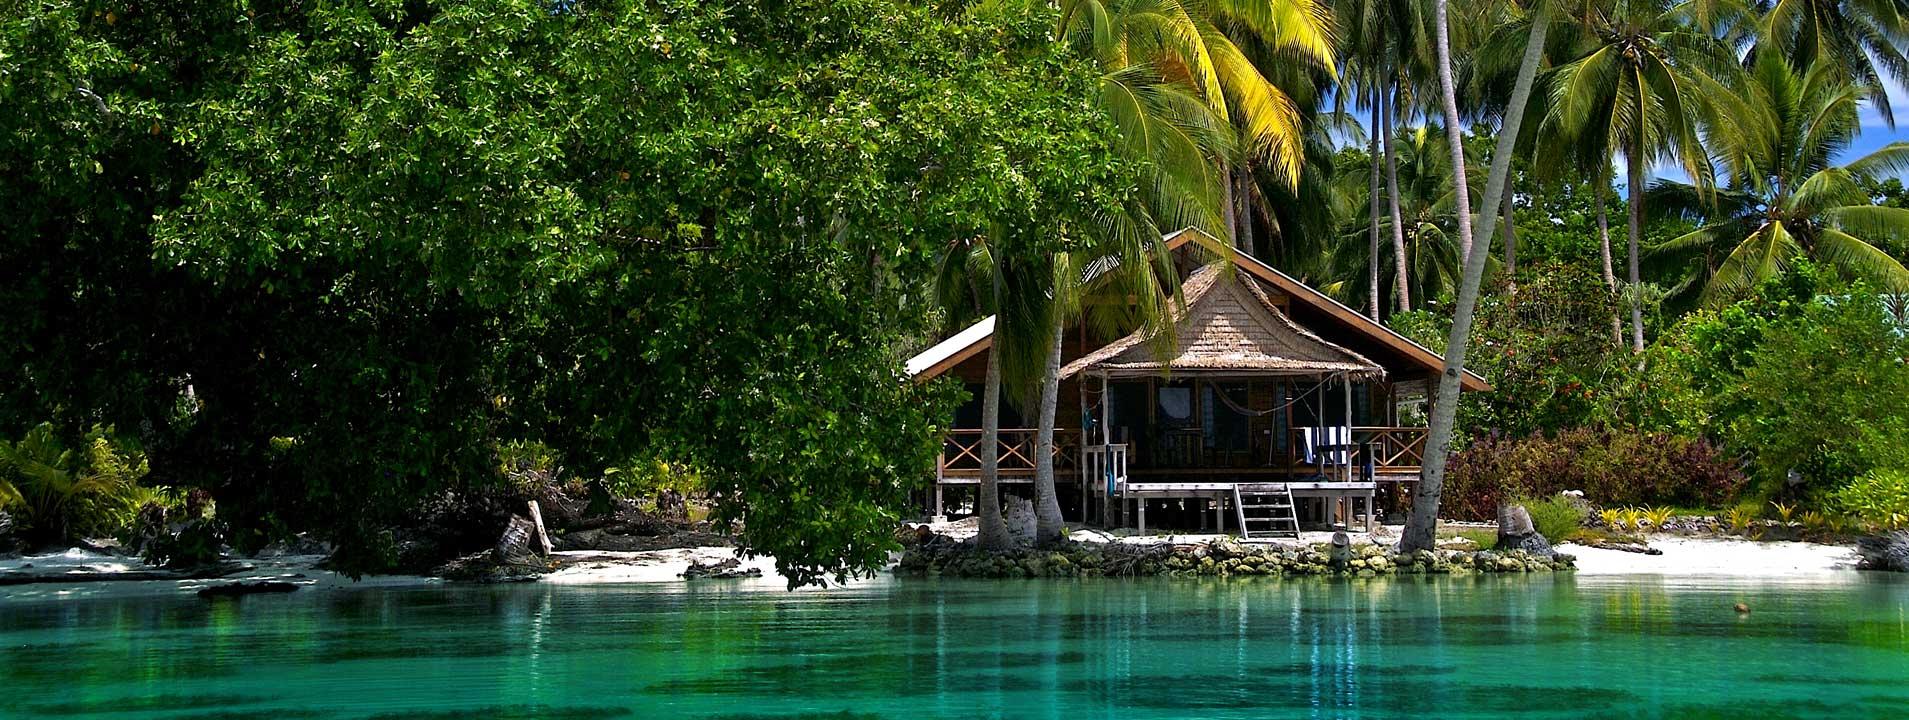 Uepi Resort Solomon Islands